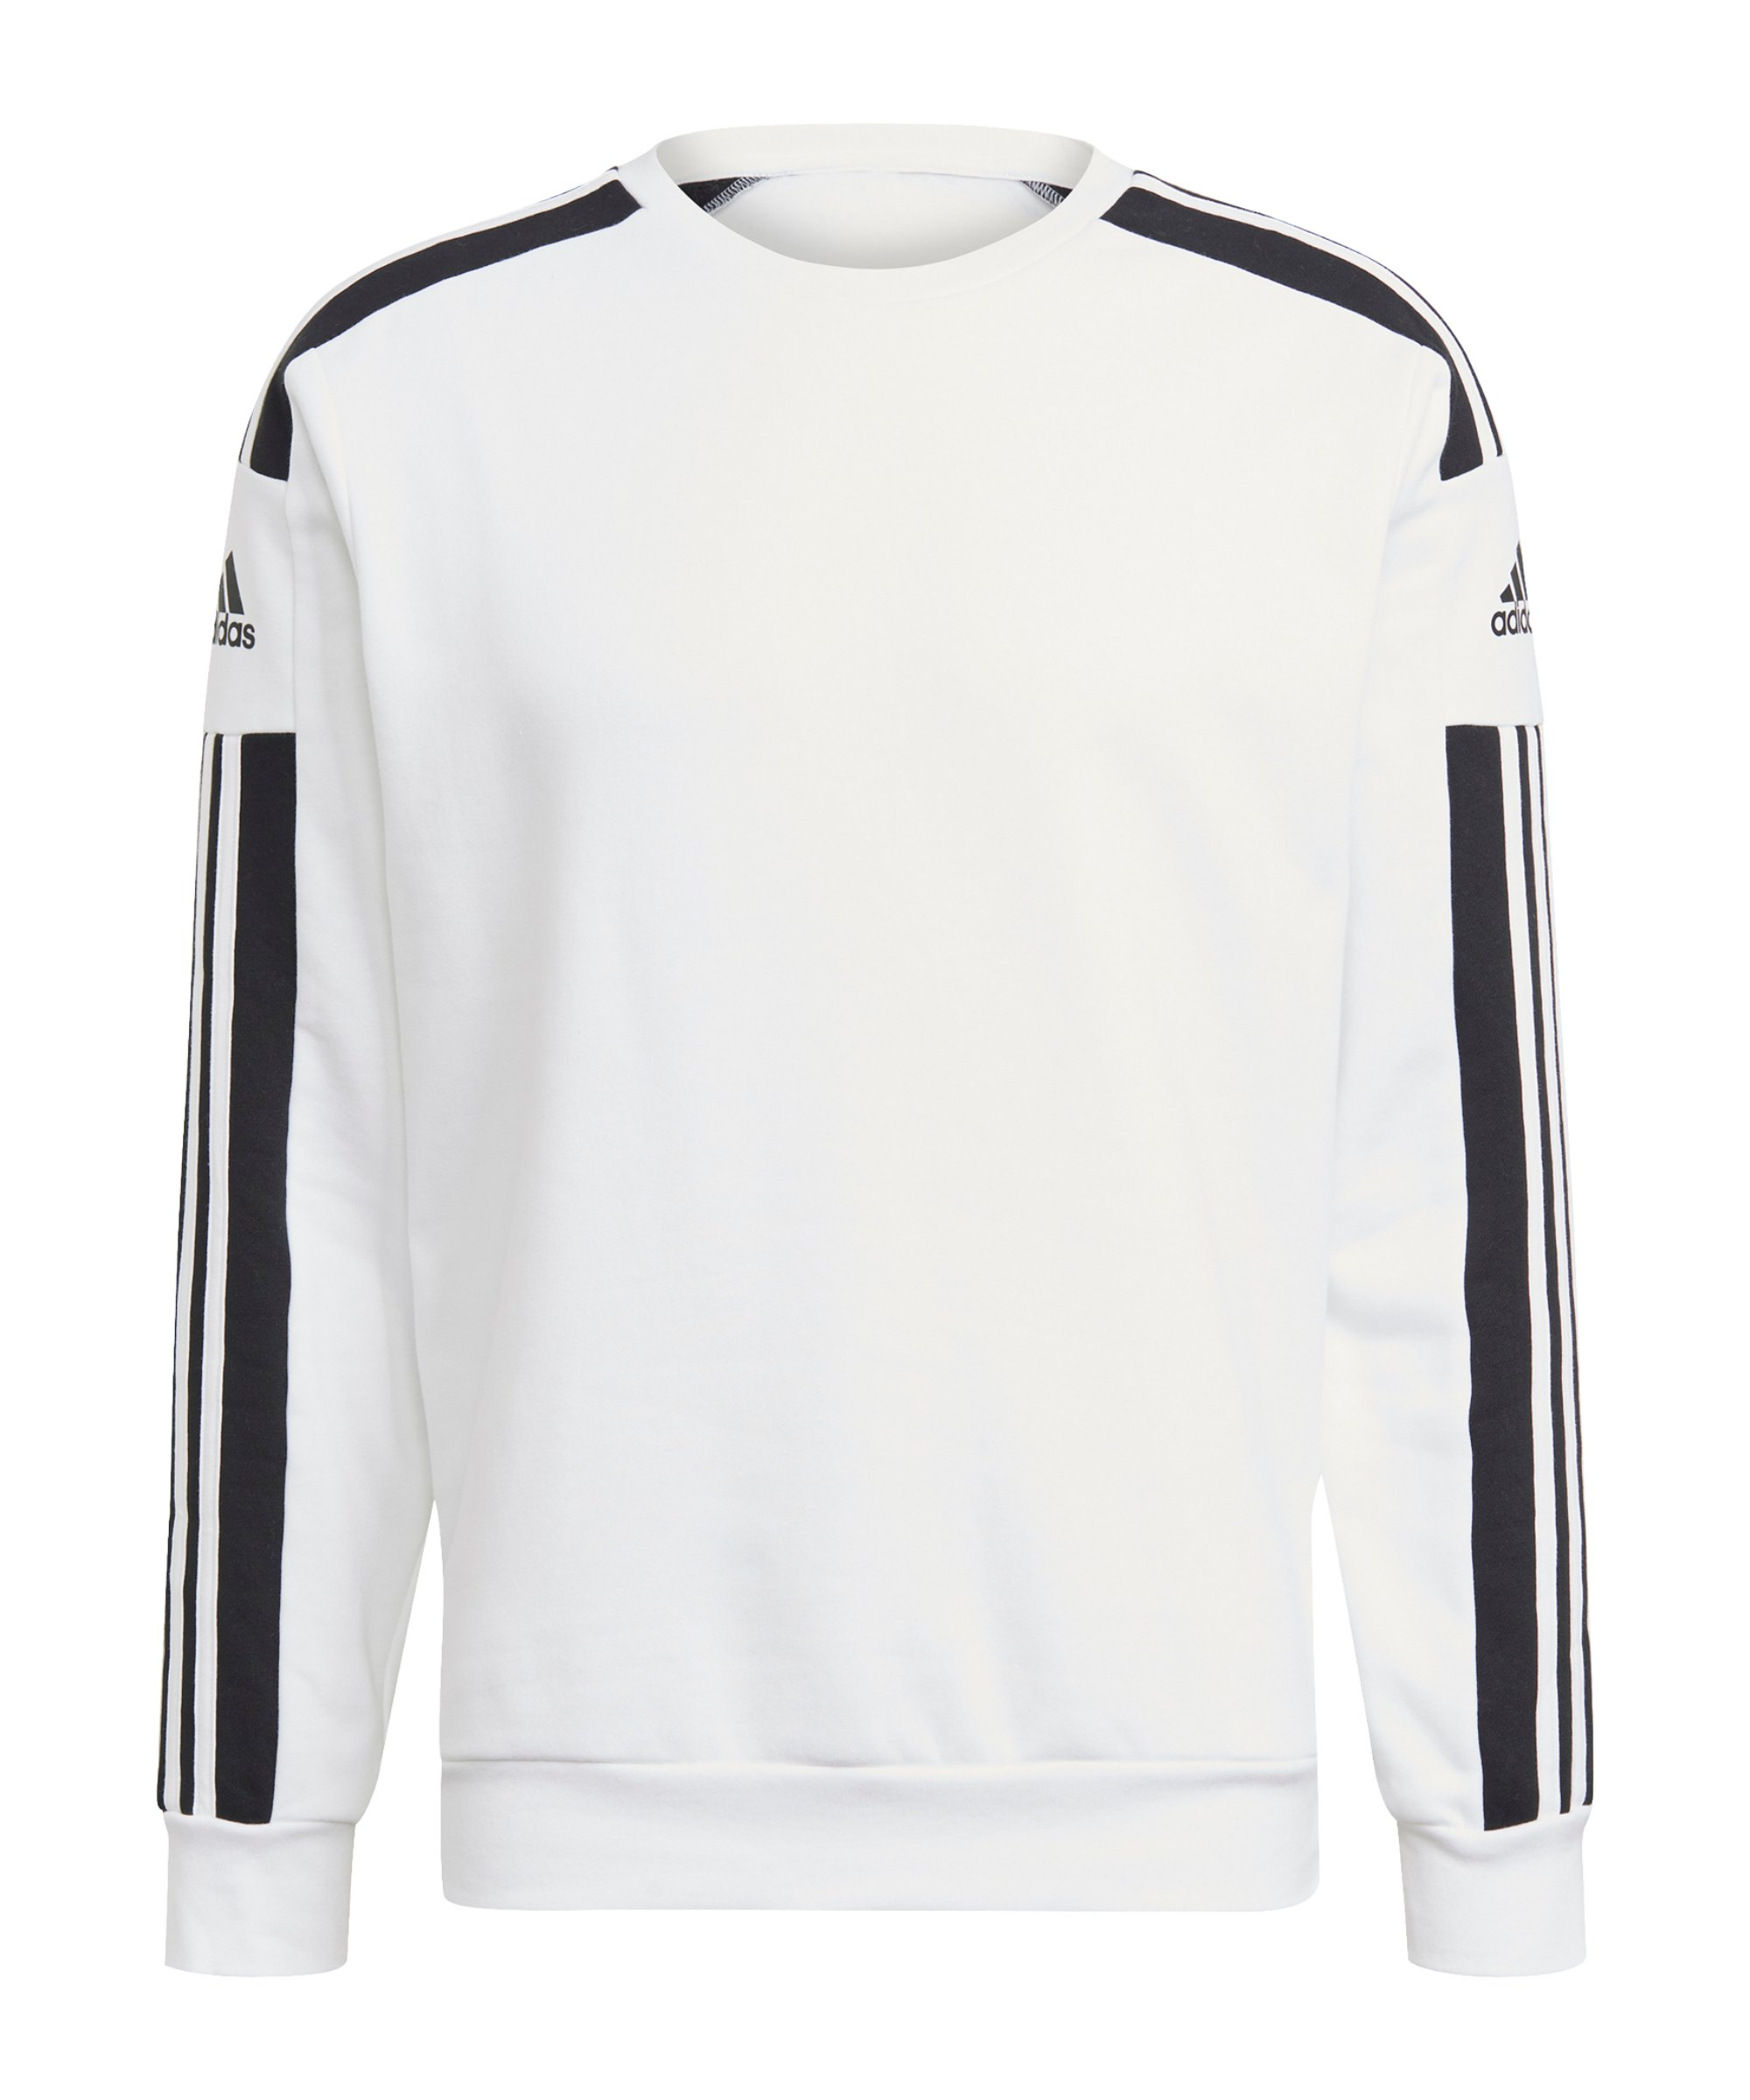 adidas Squadra 21 Sweatshirt Weiss - weiss